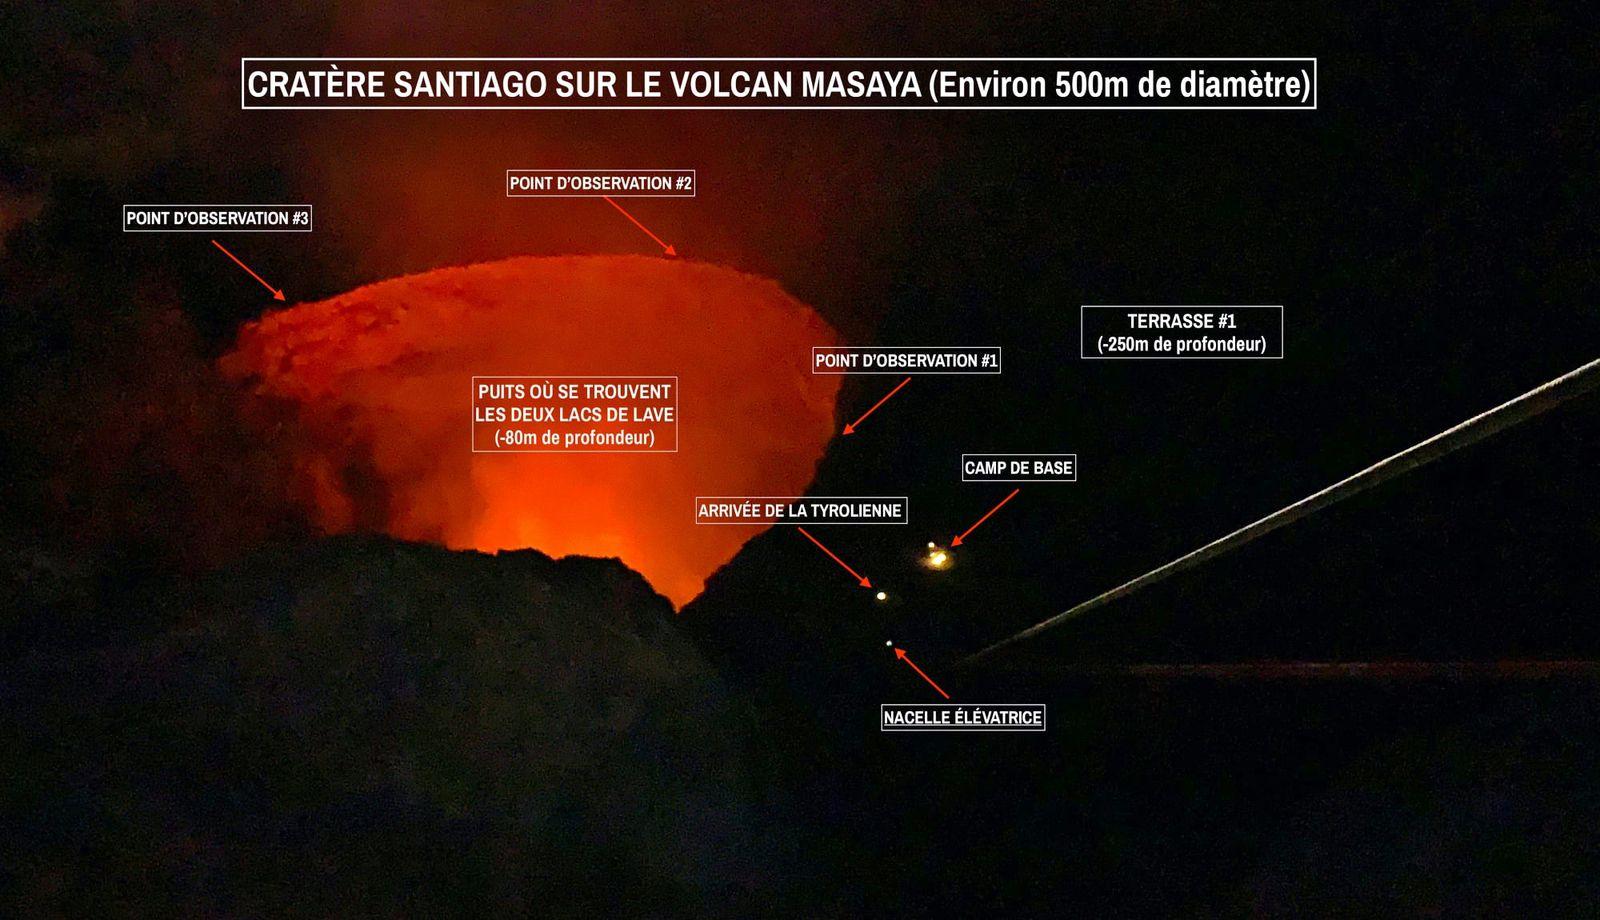 Masaya, Santiaguo crater - photo and captions Tanguy de St Cyr. 05/10/2021 / 1:07 am